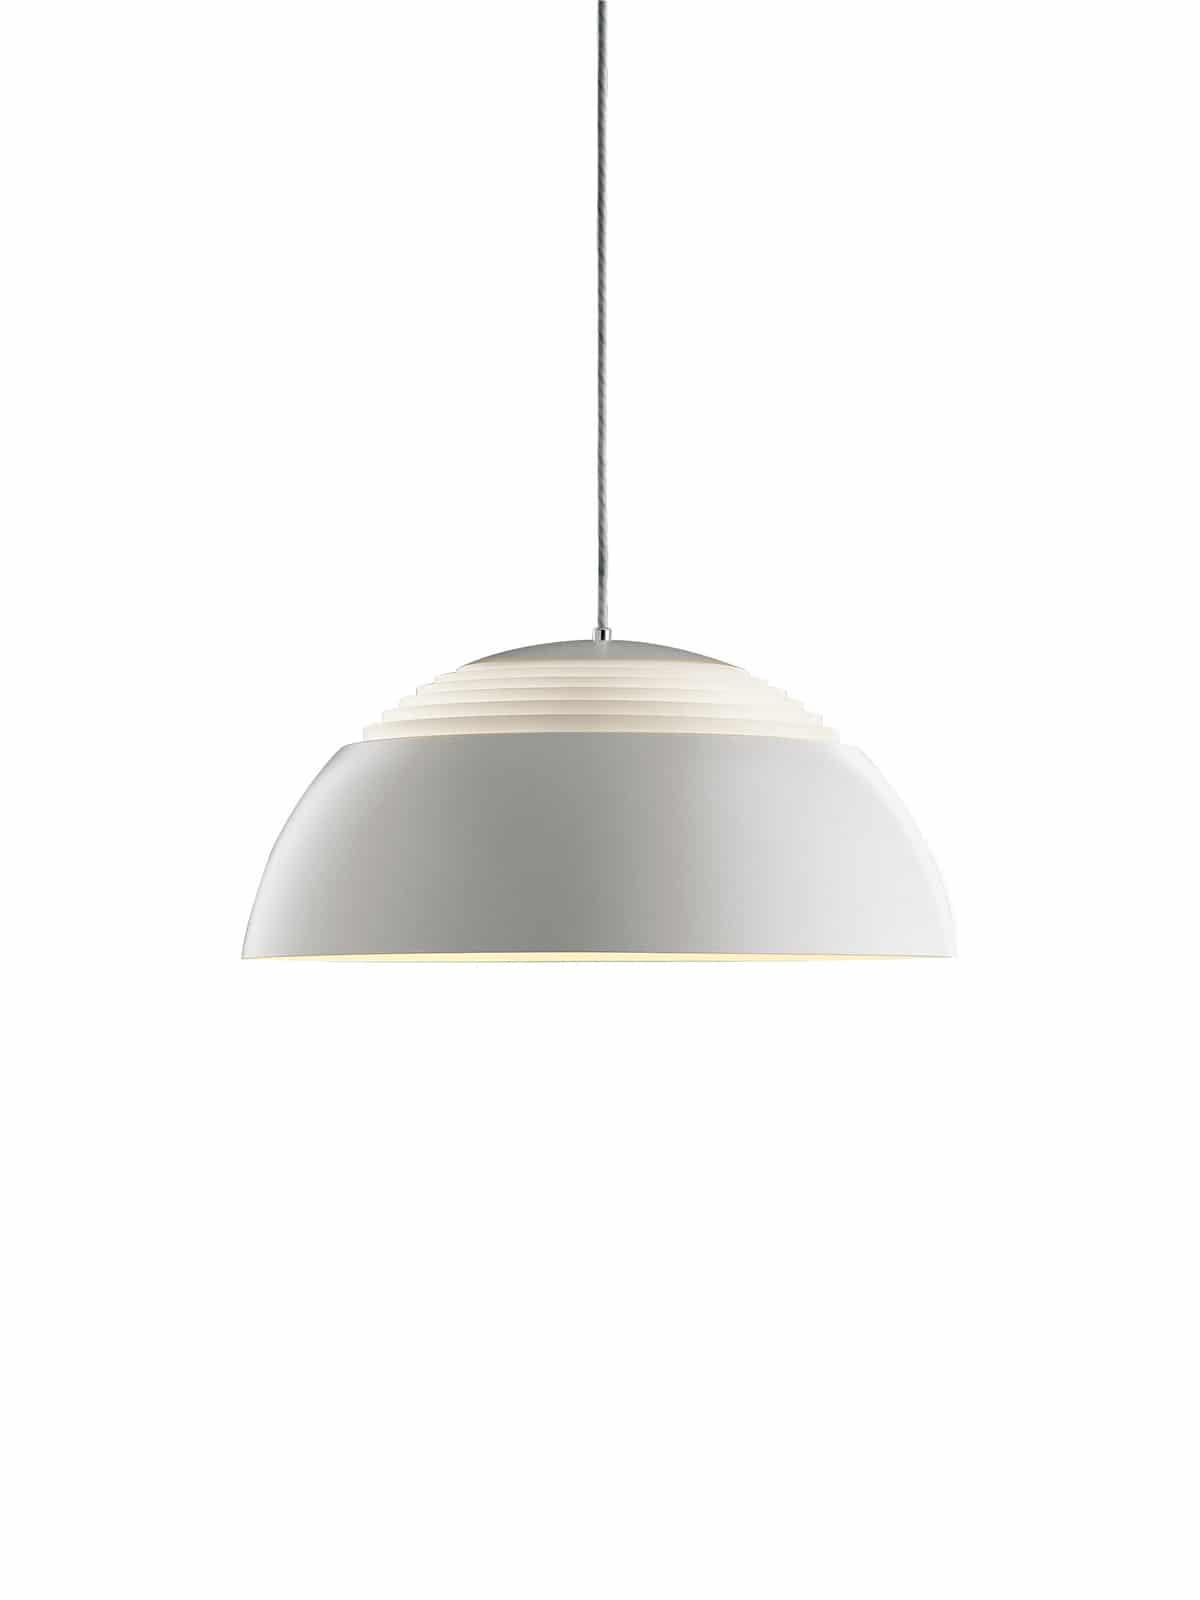 Pendelleuchte AJ Royal von Arne Jacobsen